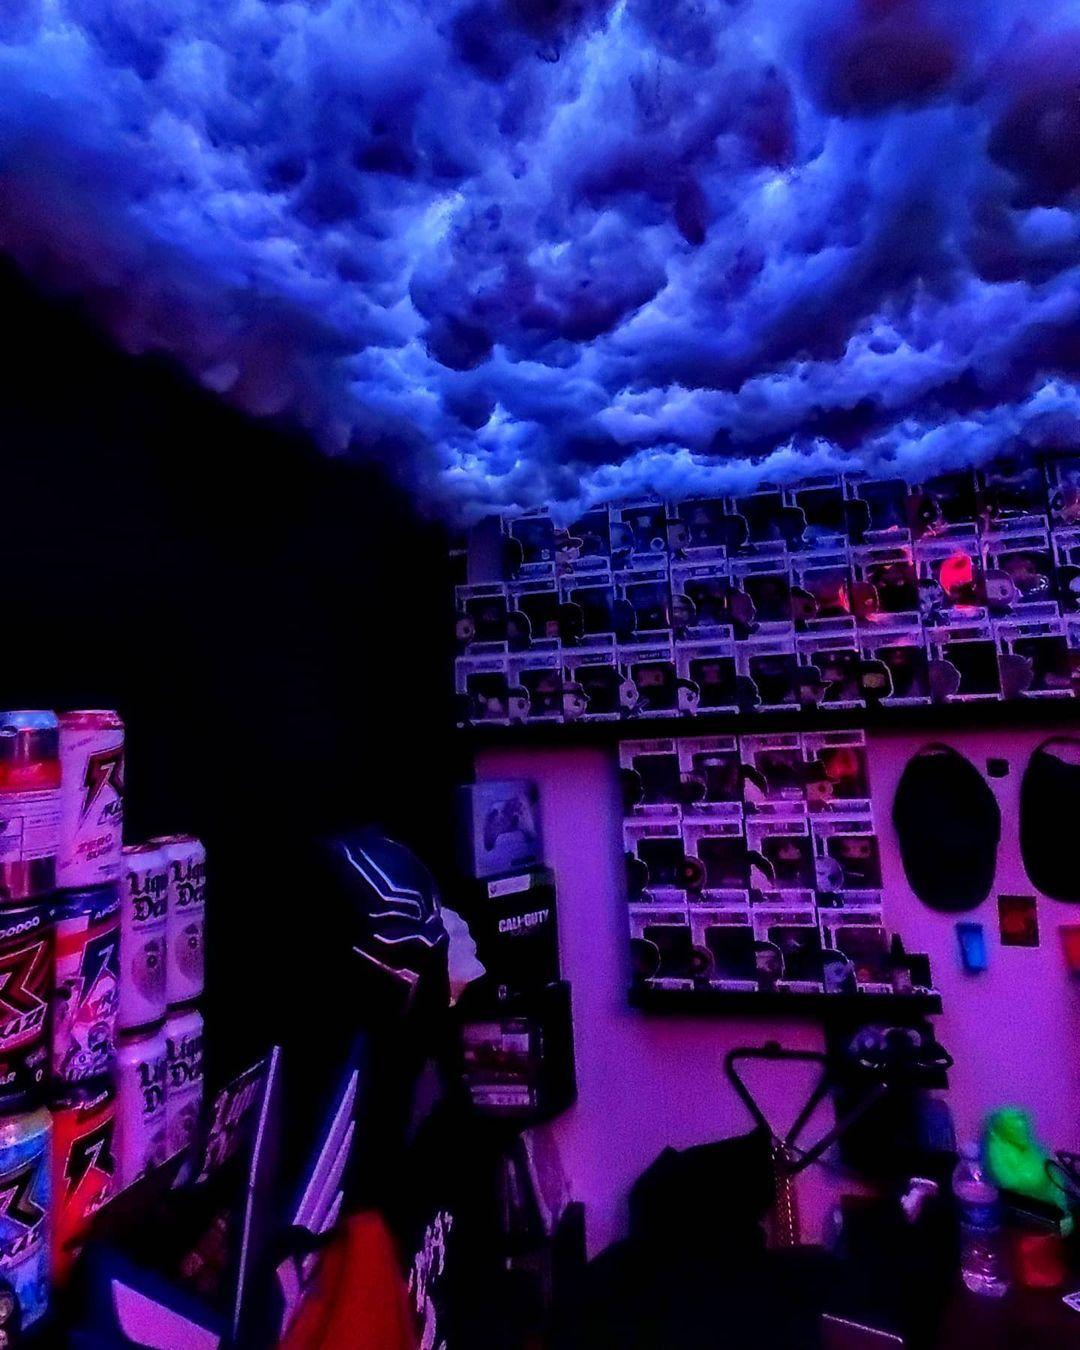 Cloud Ceiling Diy Safe